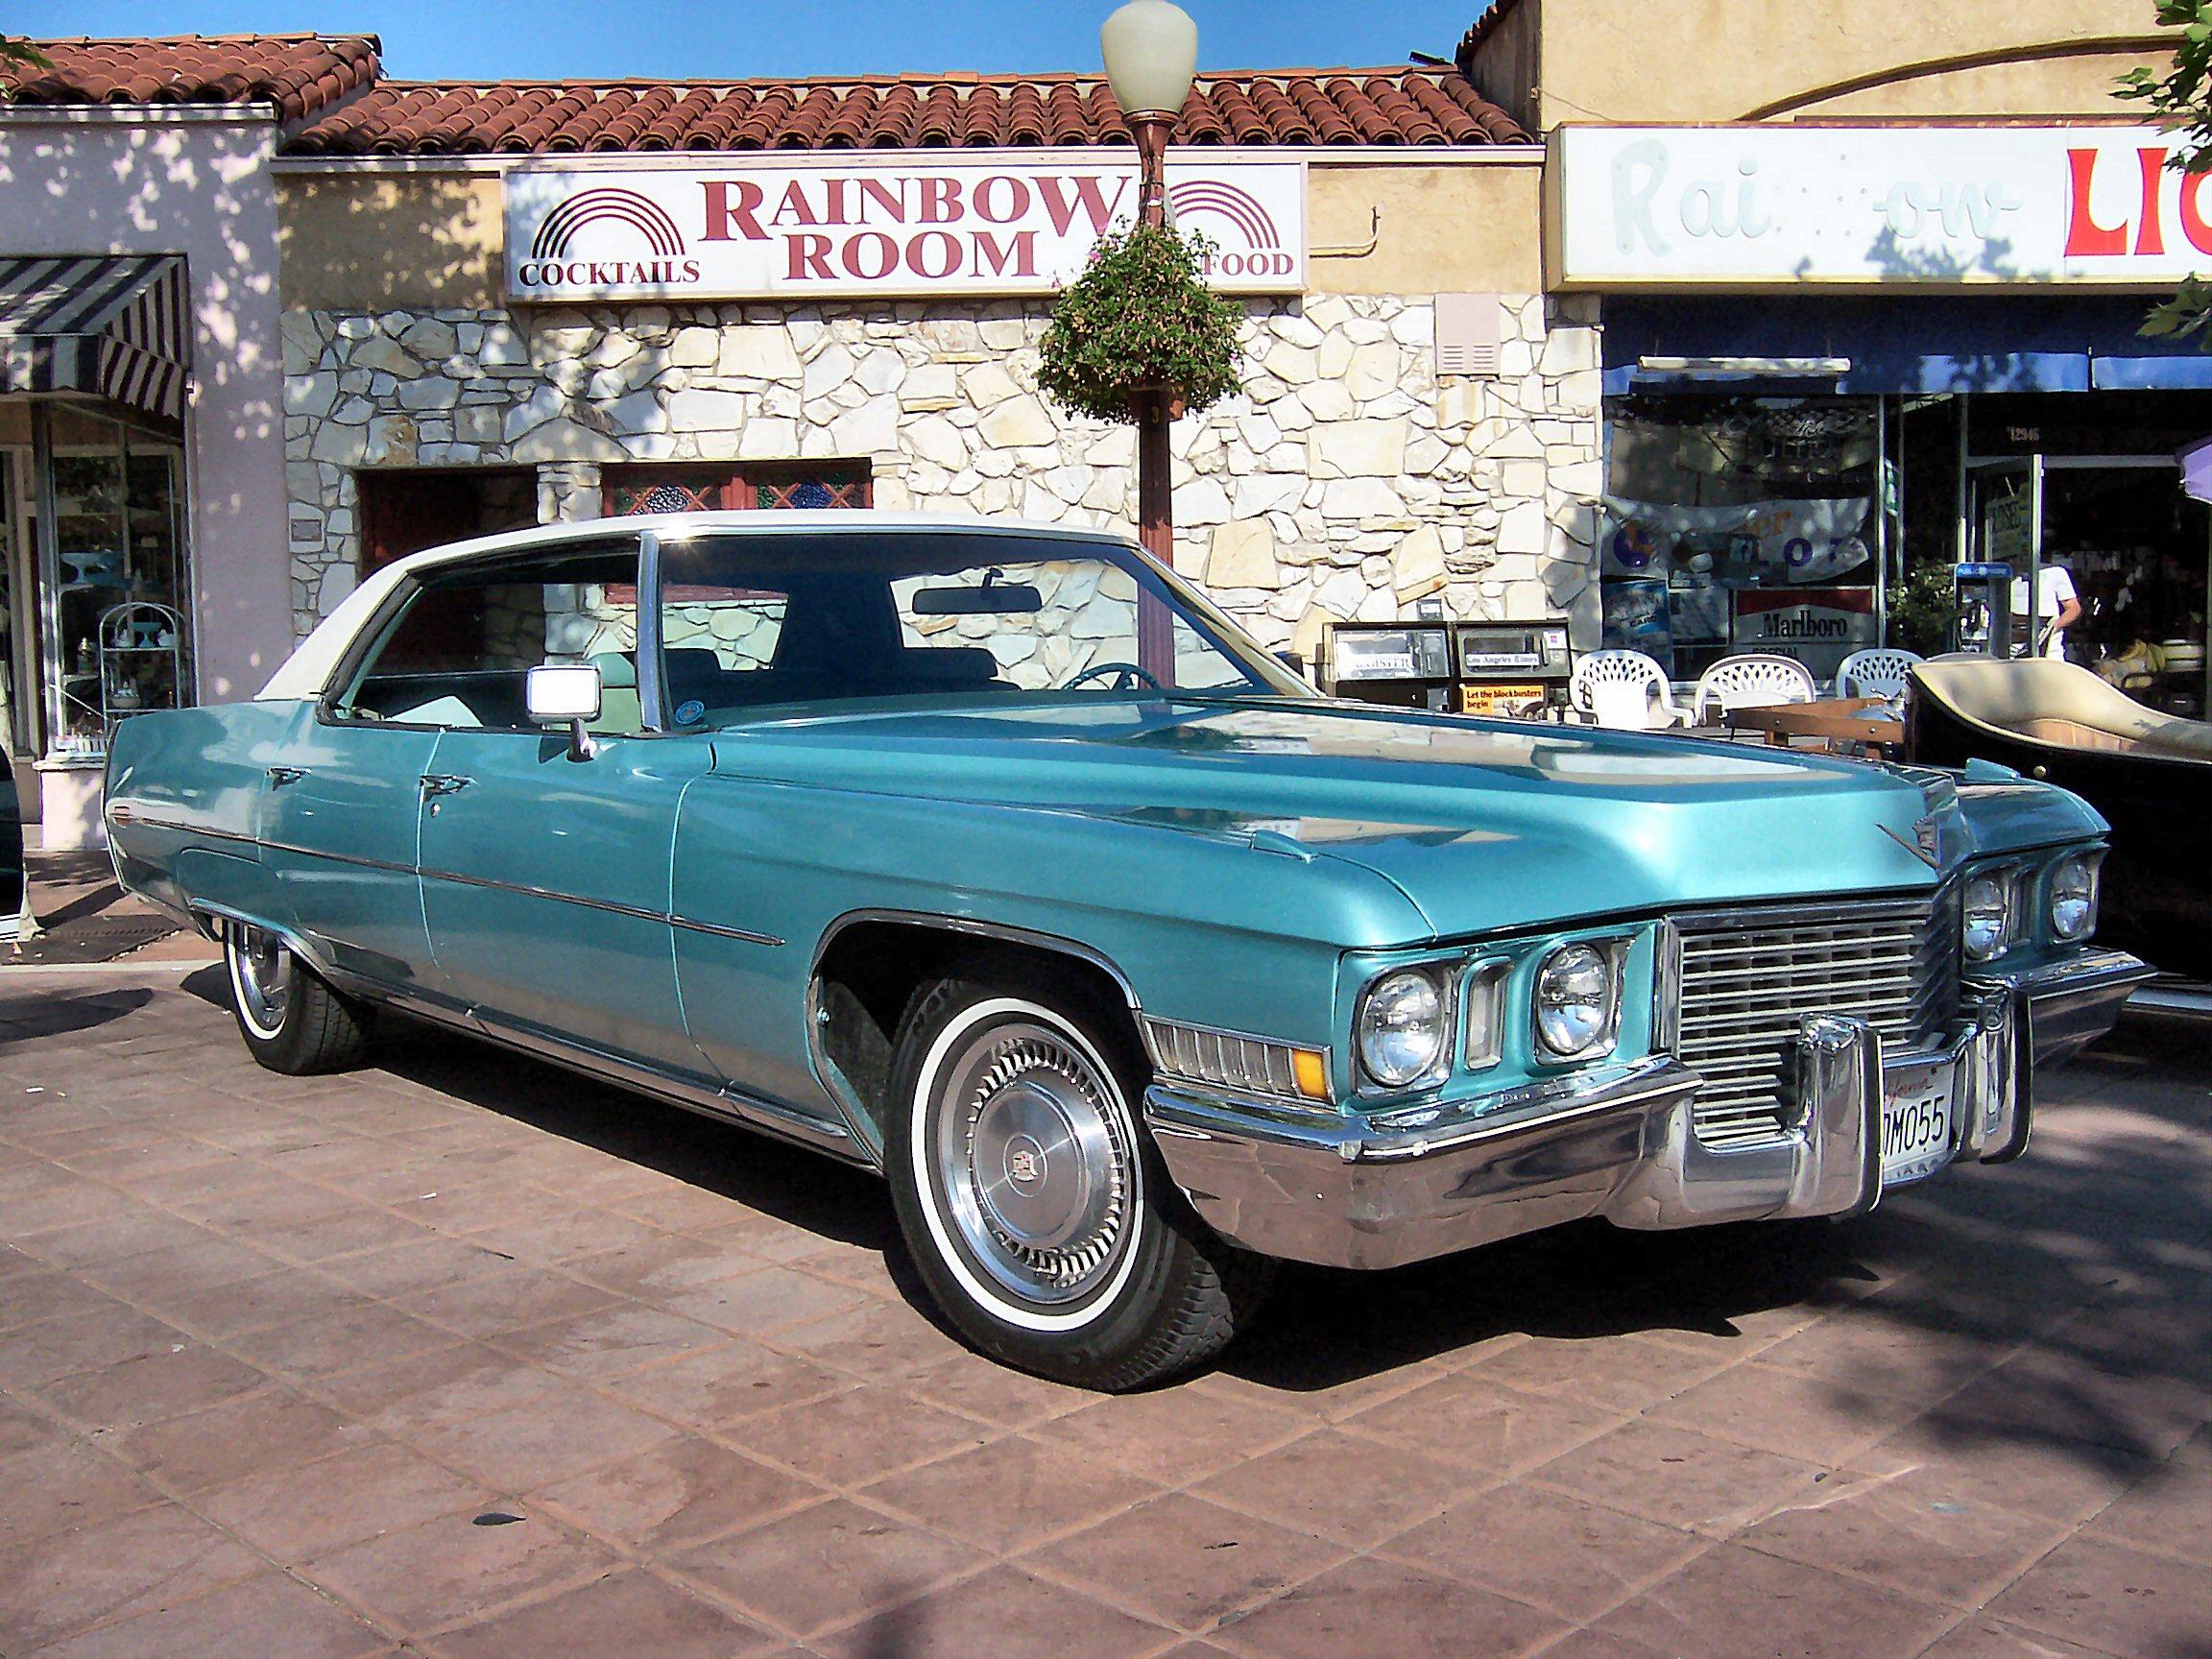 File:1972 Cadillac Sedan de Ville.jpg - Wikimedia Commons